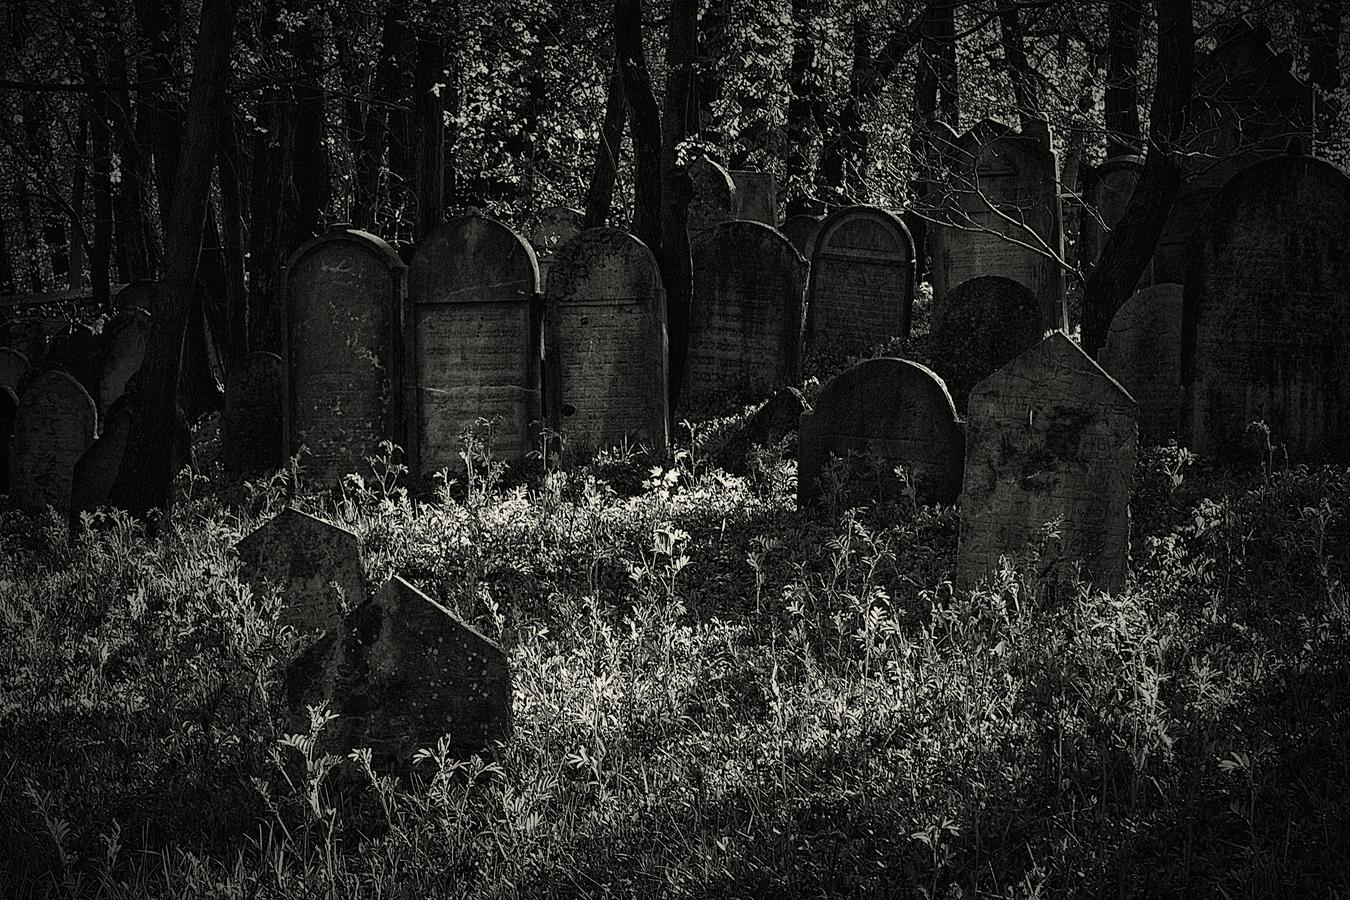 Ticho na hřbitově